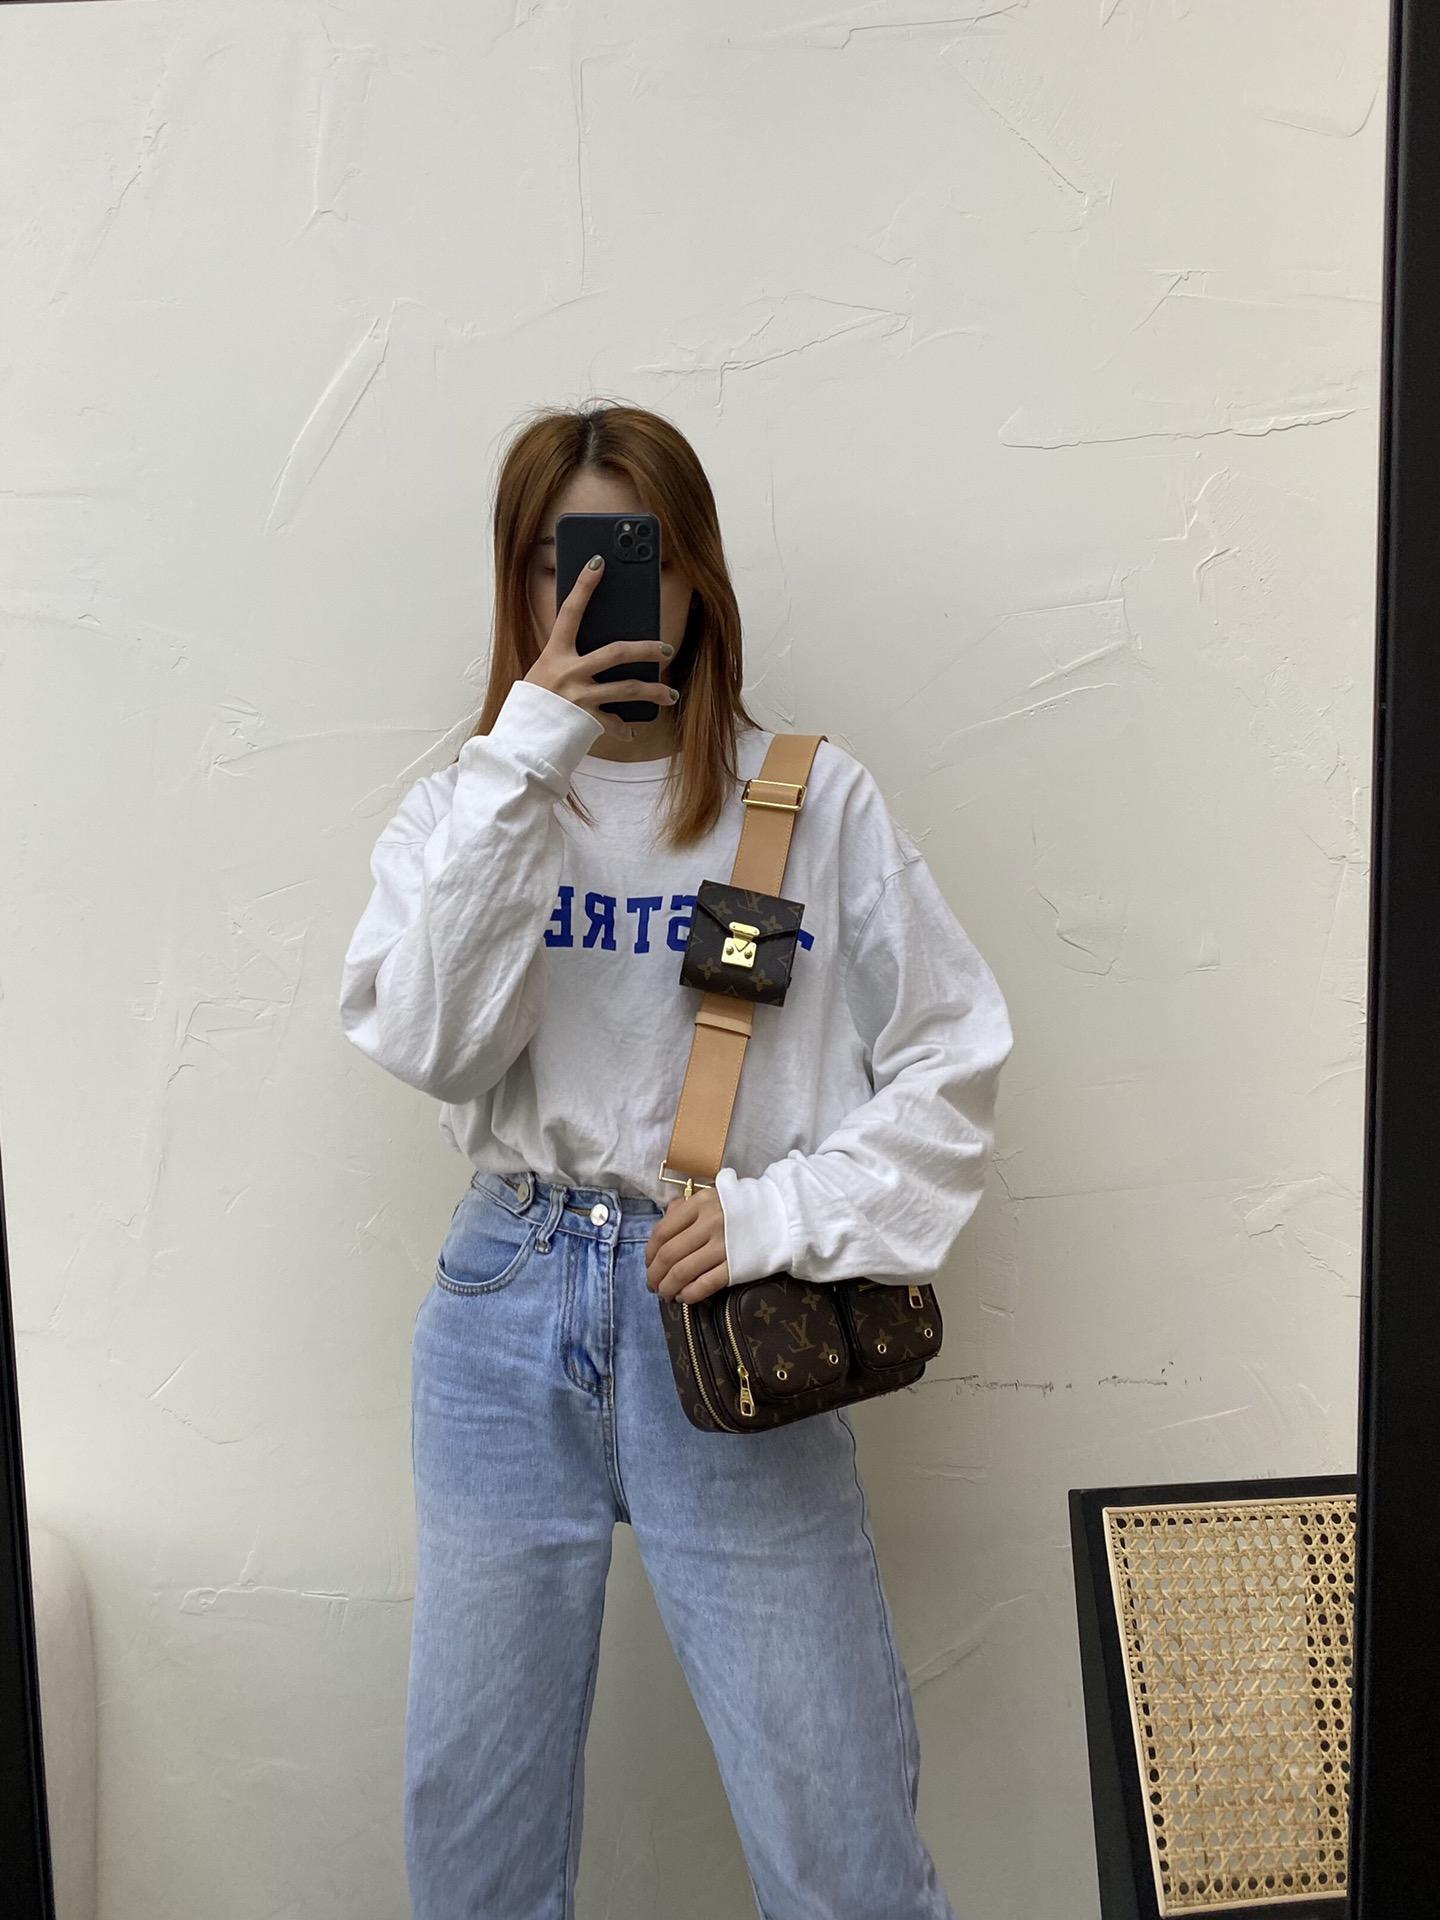 【¥1250】LV最新二合一机车相机包41029 又酷又飒 百搭时尚